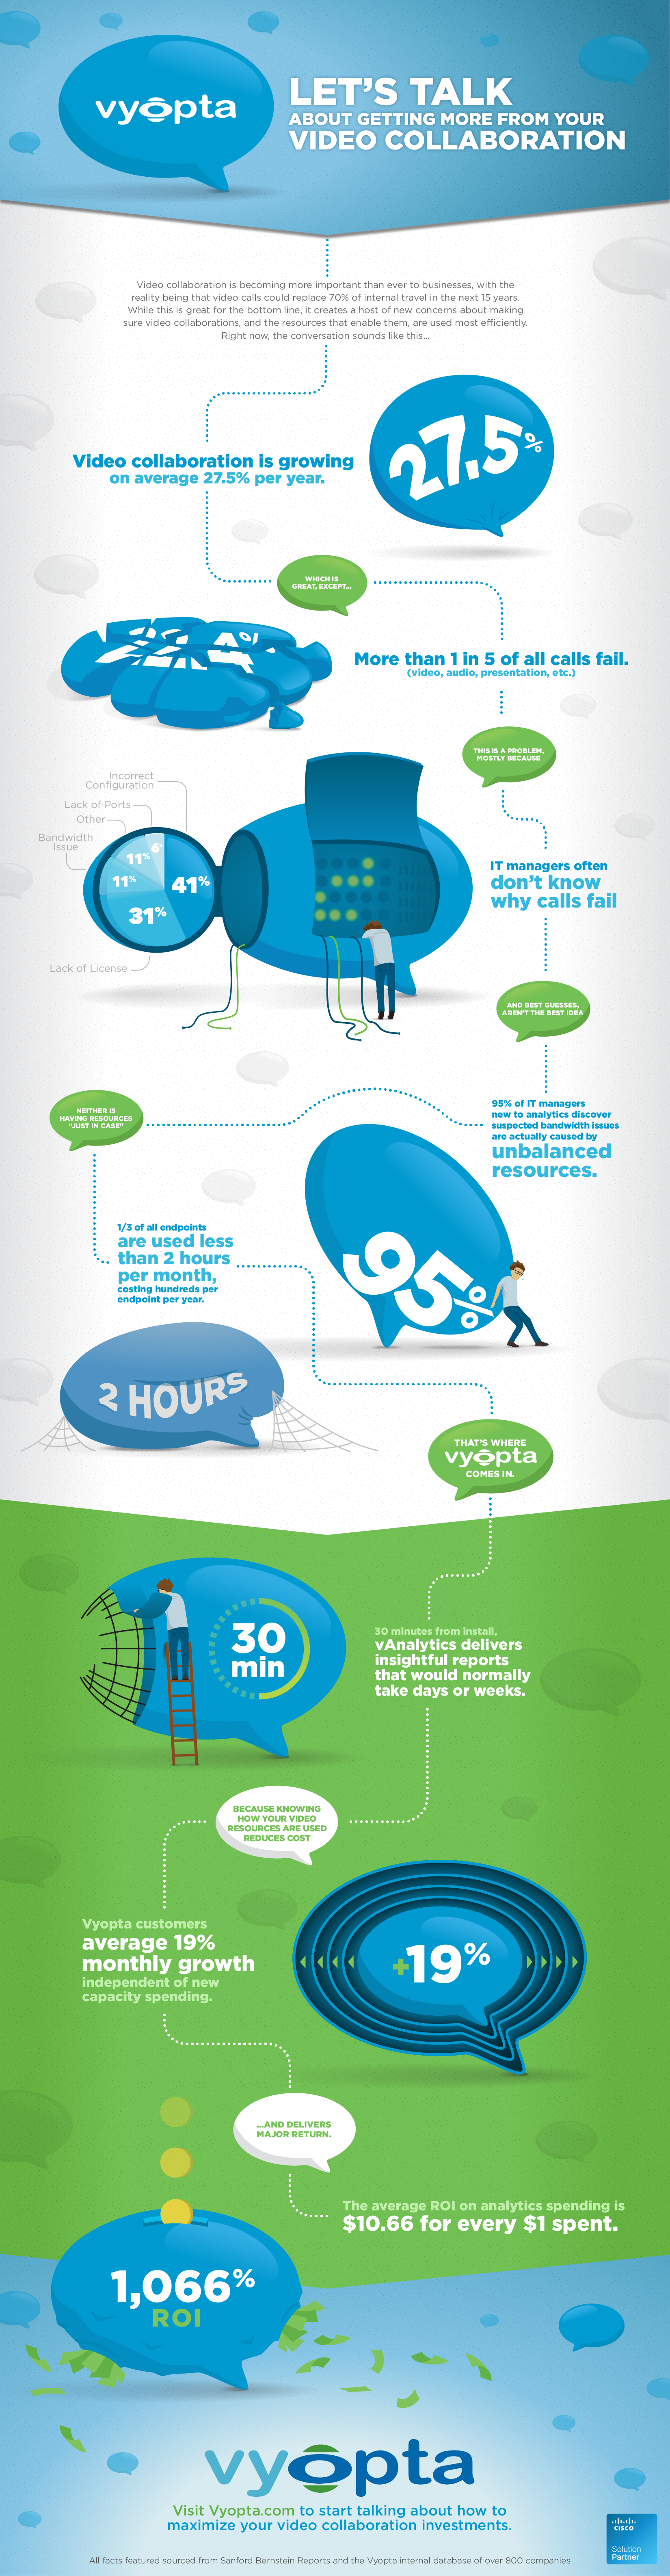 Vyopta_Infographic_110614_2.png